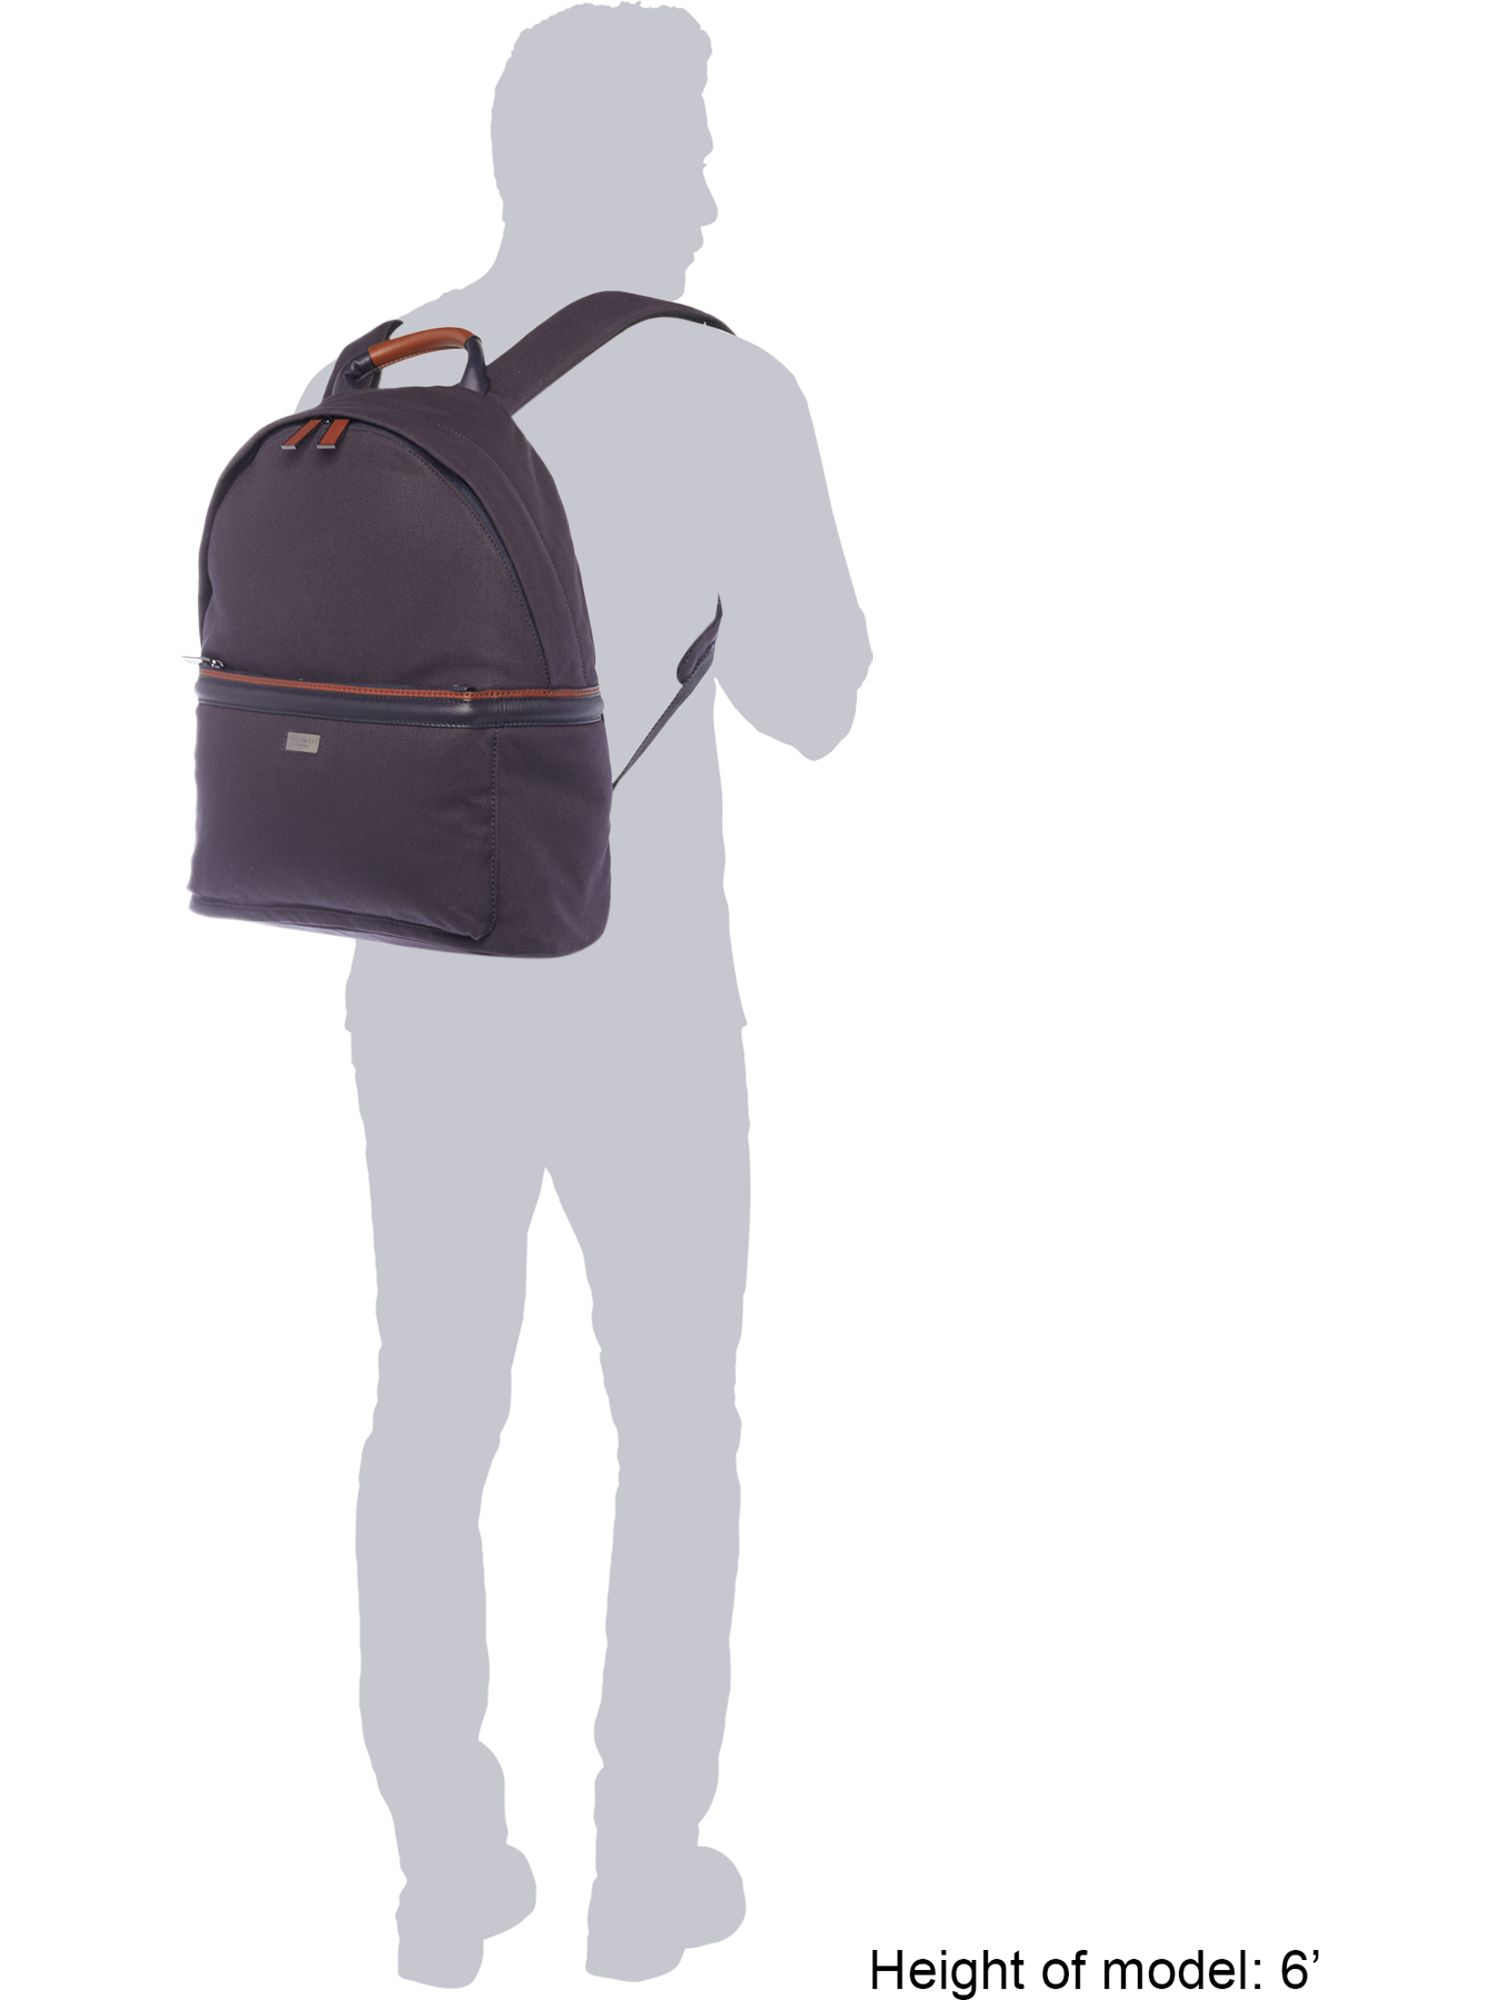 lyst ted baker canvas and leather backpack in blue for men. Black Bedroom Furniture Sets. Home Design Ideas